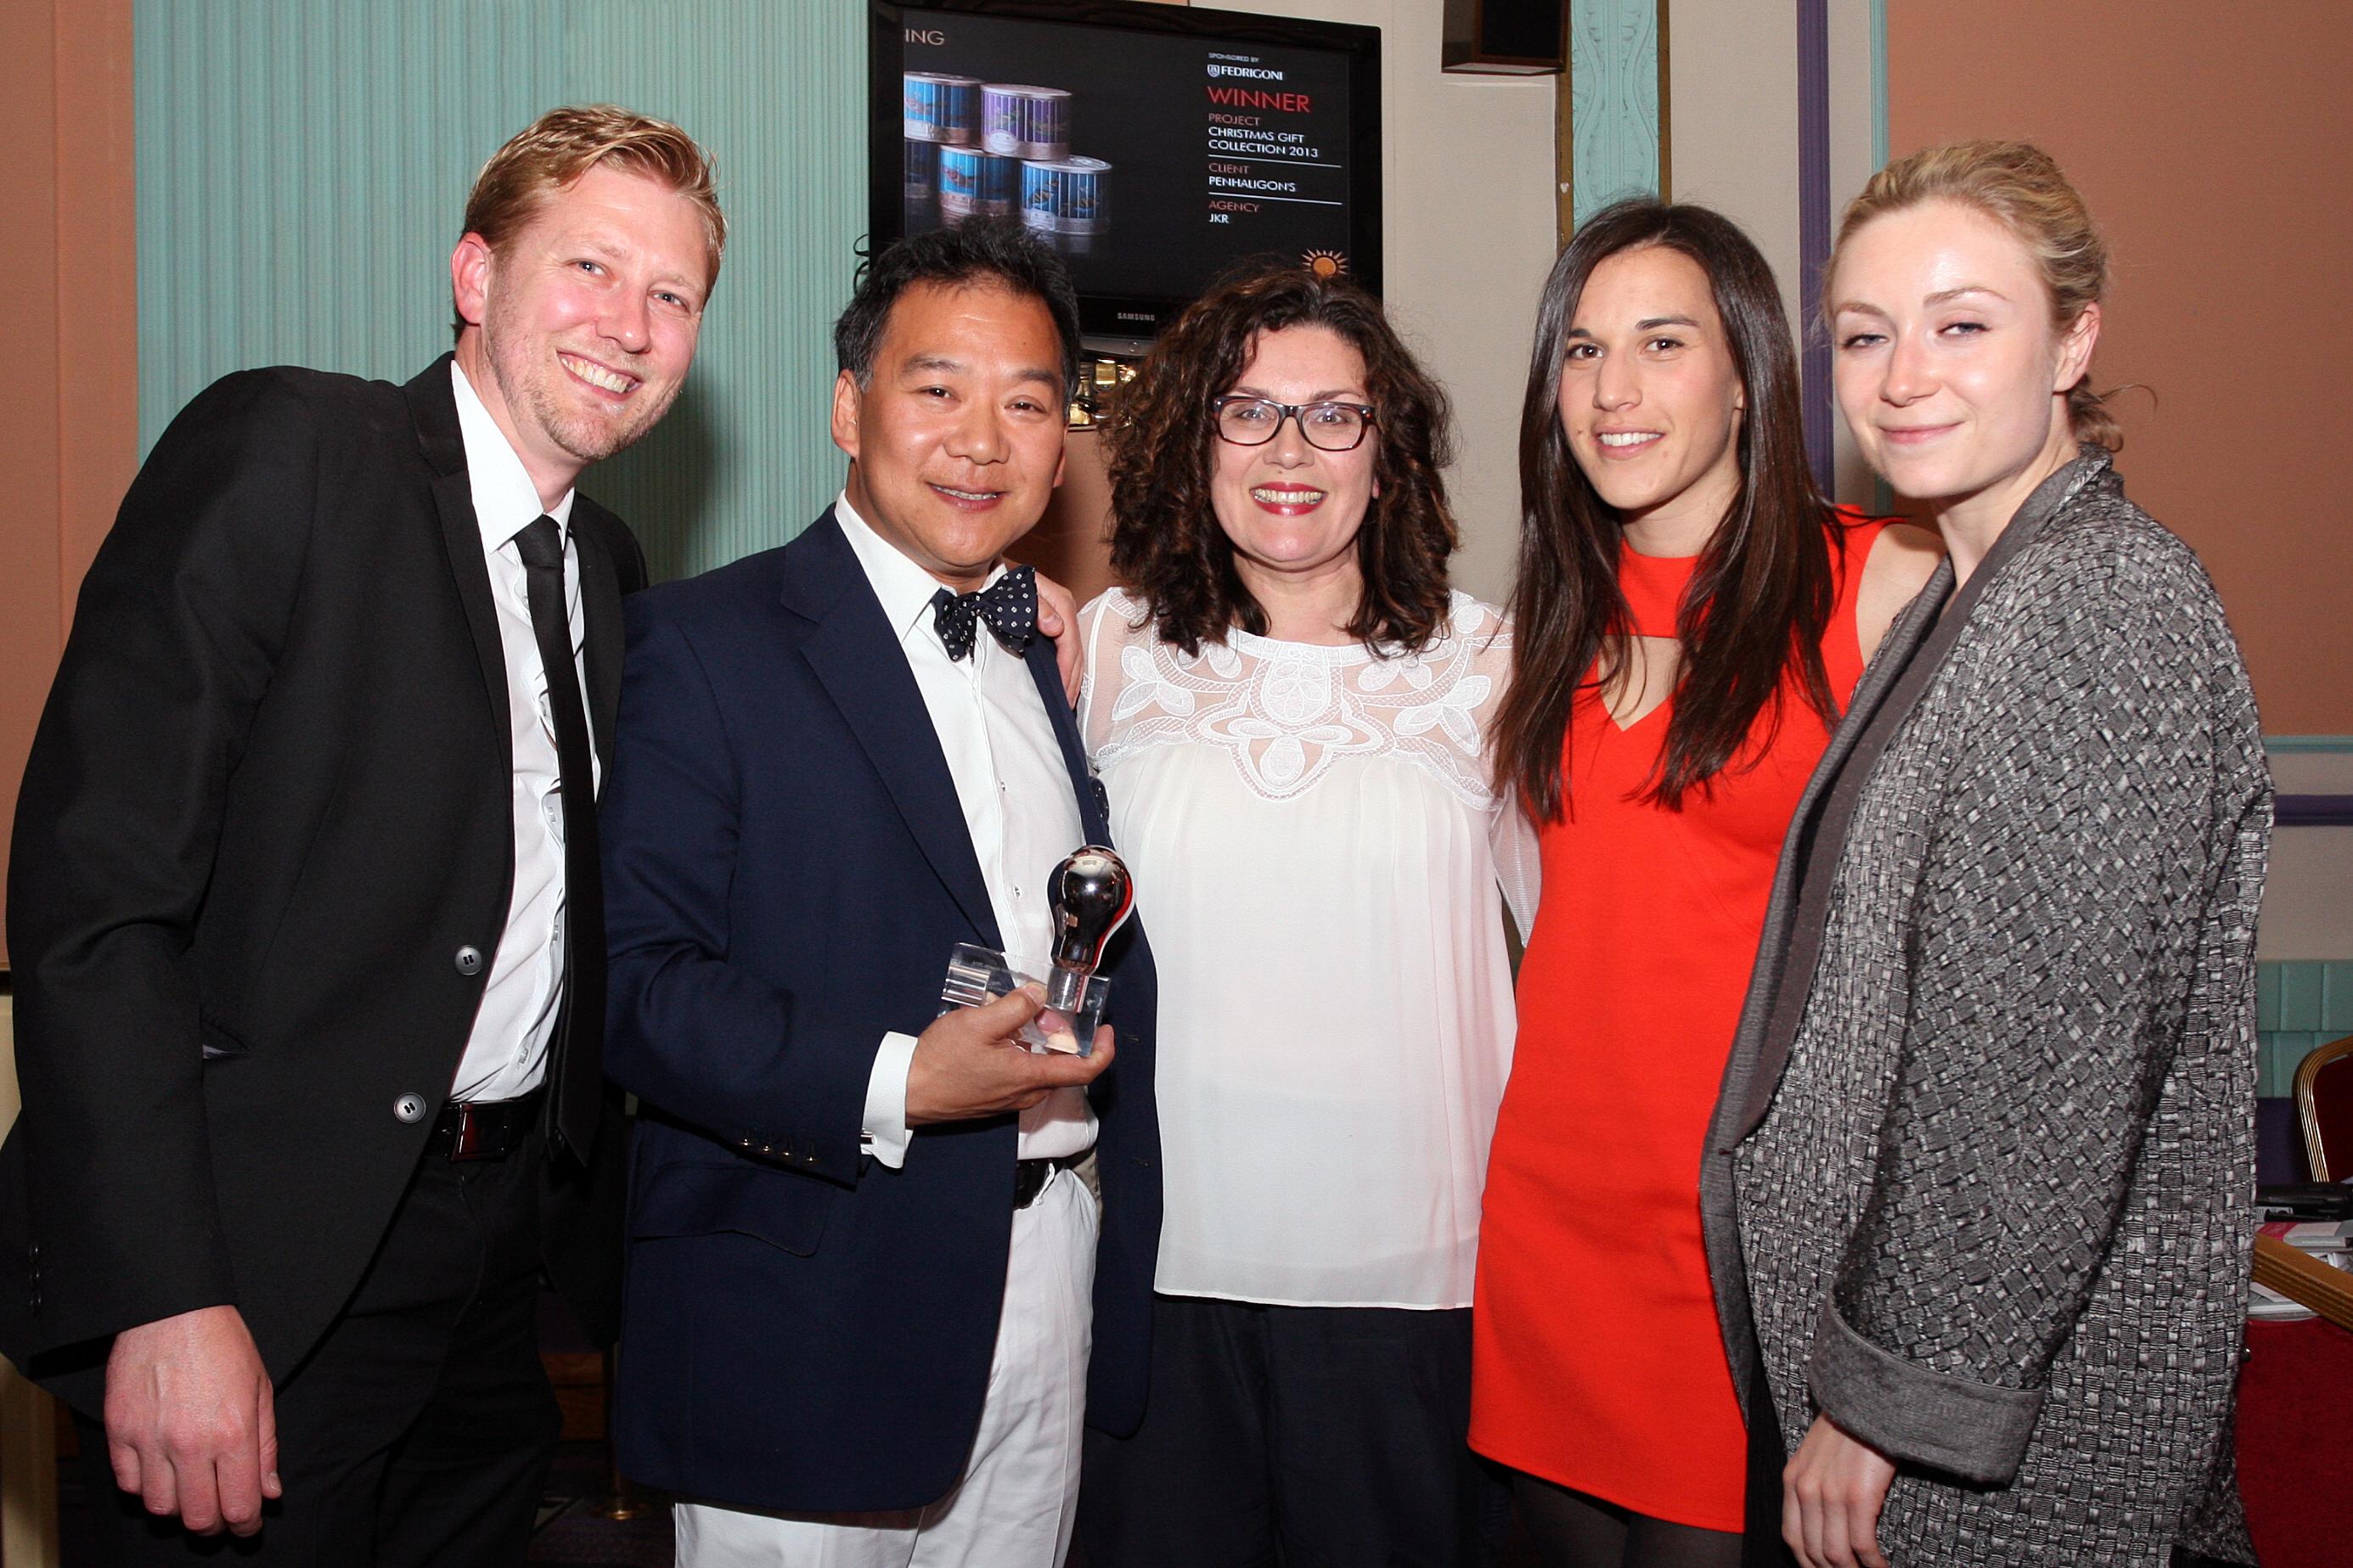 Domus Wins at Design Week Awards 2014